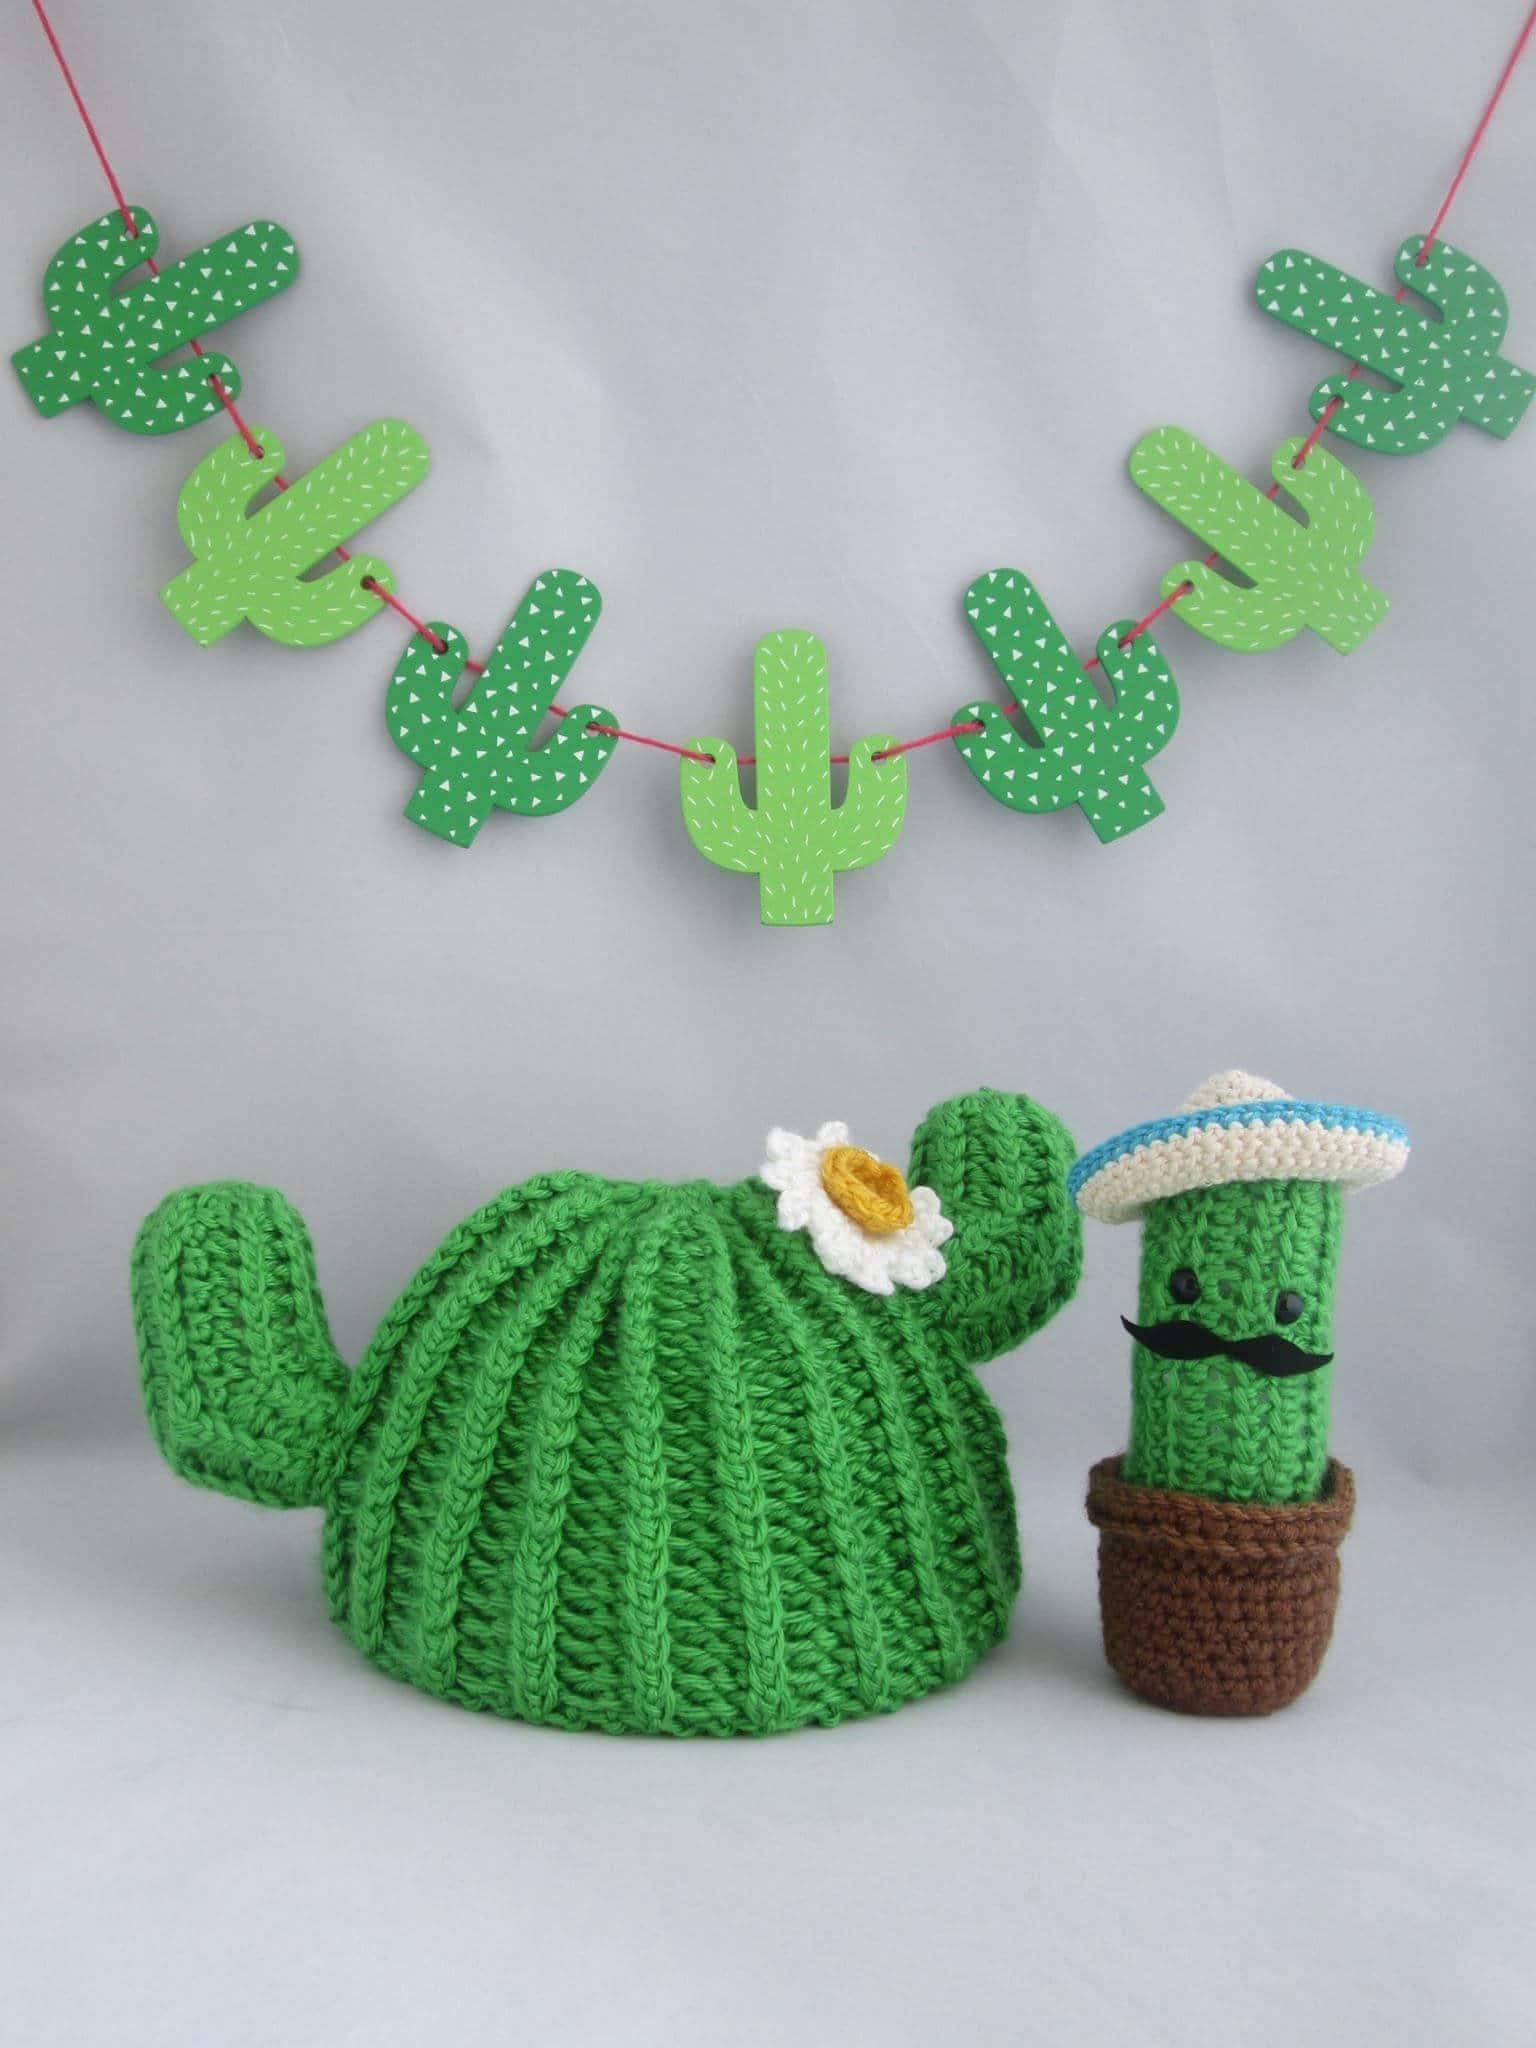 Cactus Amigurumi crochet cactus crochet cactus doll. | Etsy | 2048x1536